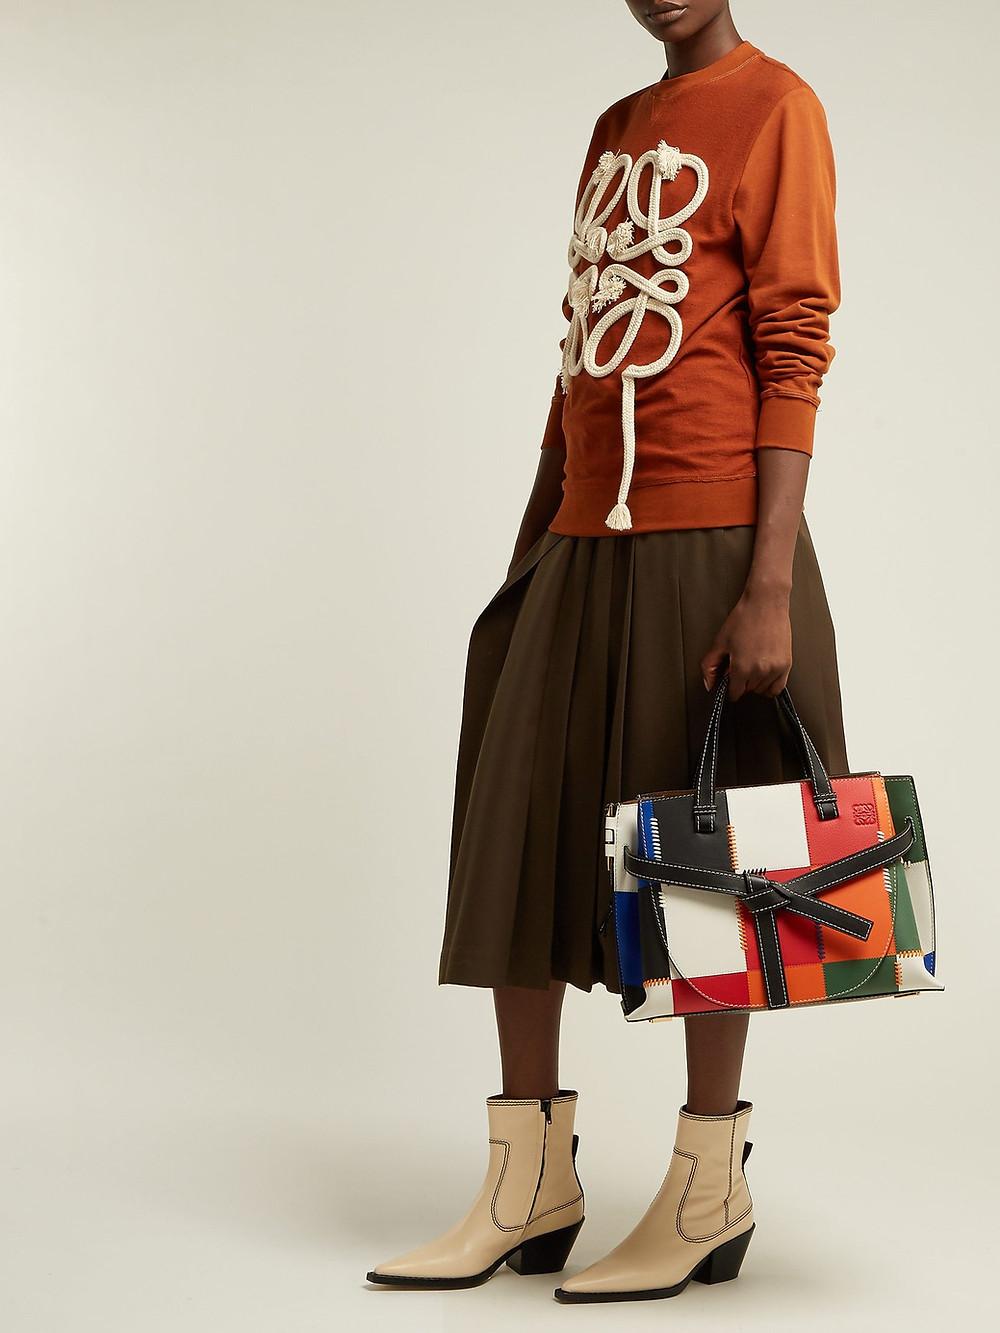 Loewe Gate patchwork leather tote bag $3,950